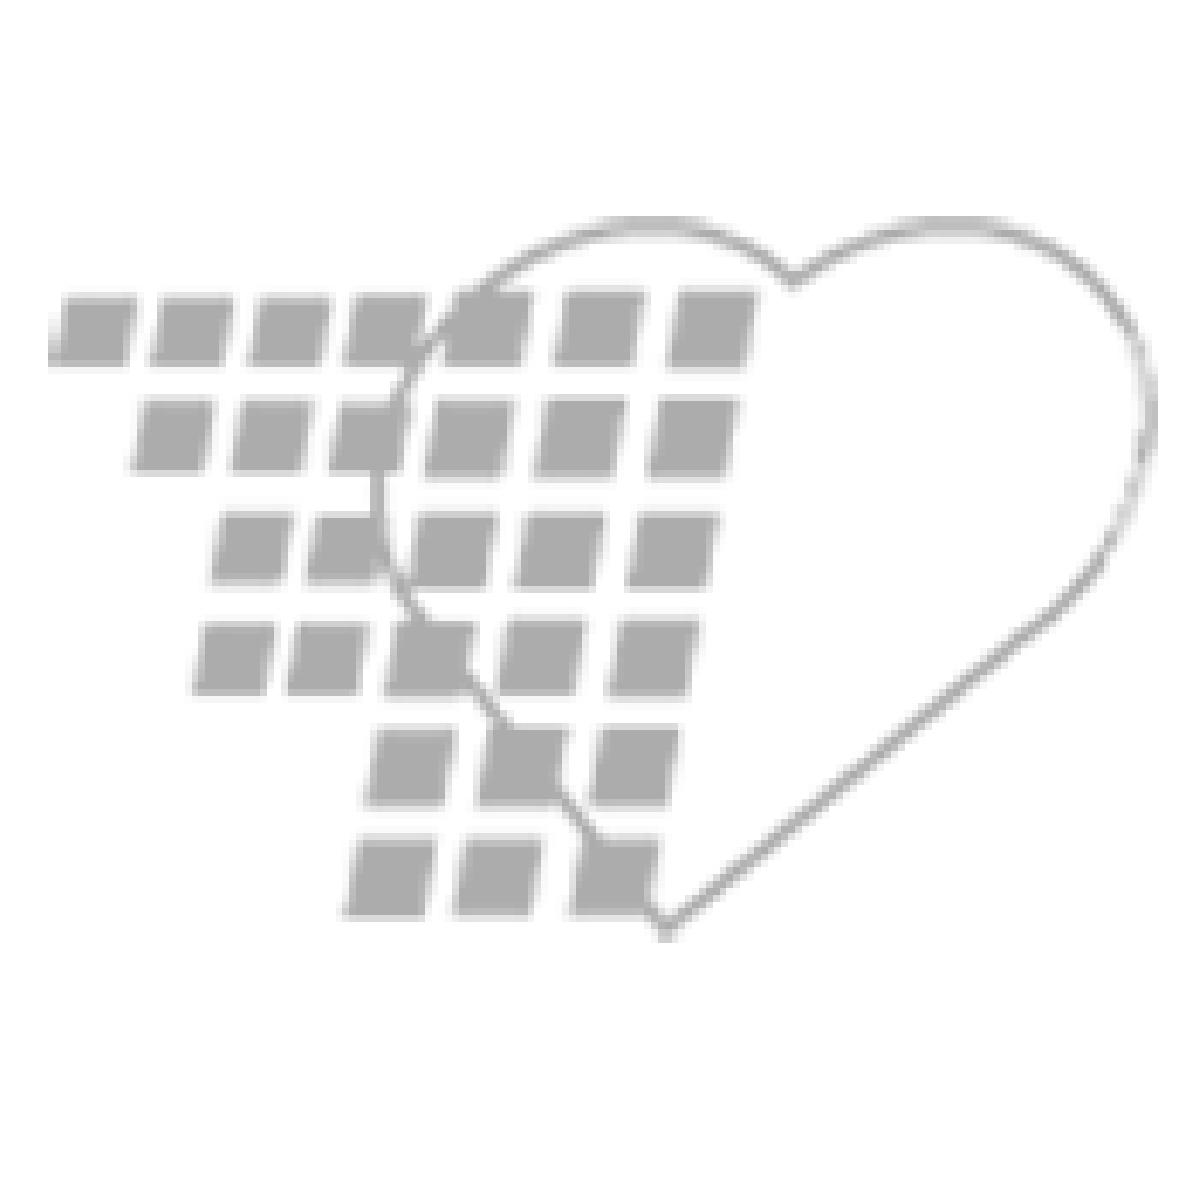 06-93-0039 - Demo Dose® Librim 5 mg - 100 Pills/Box